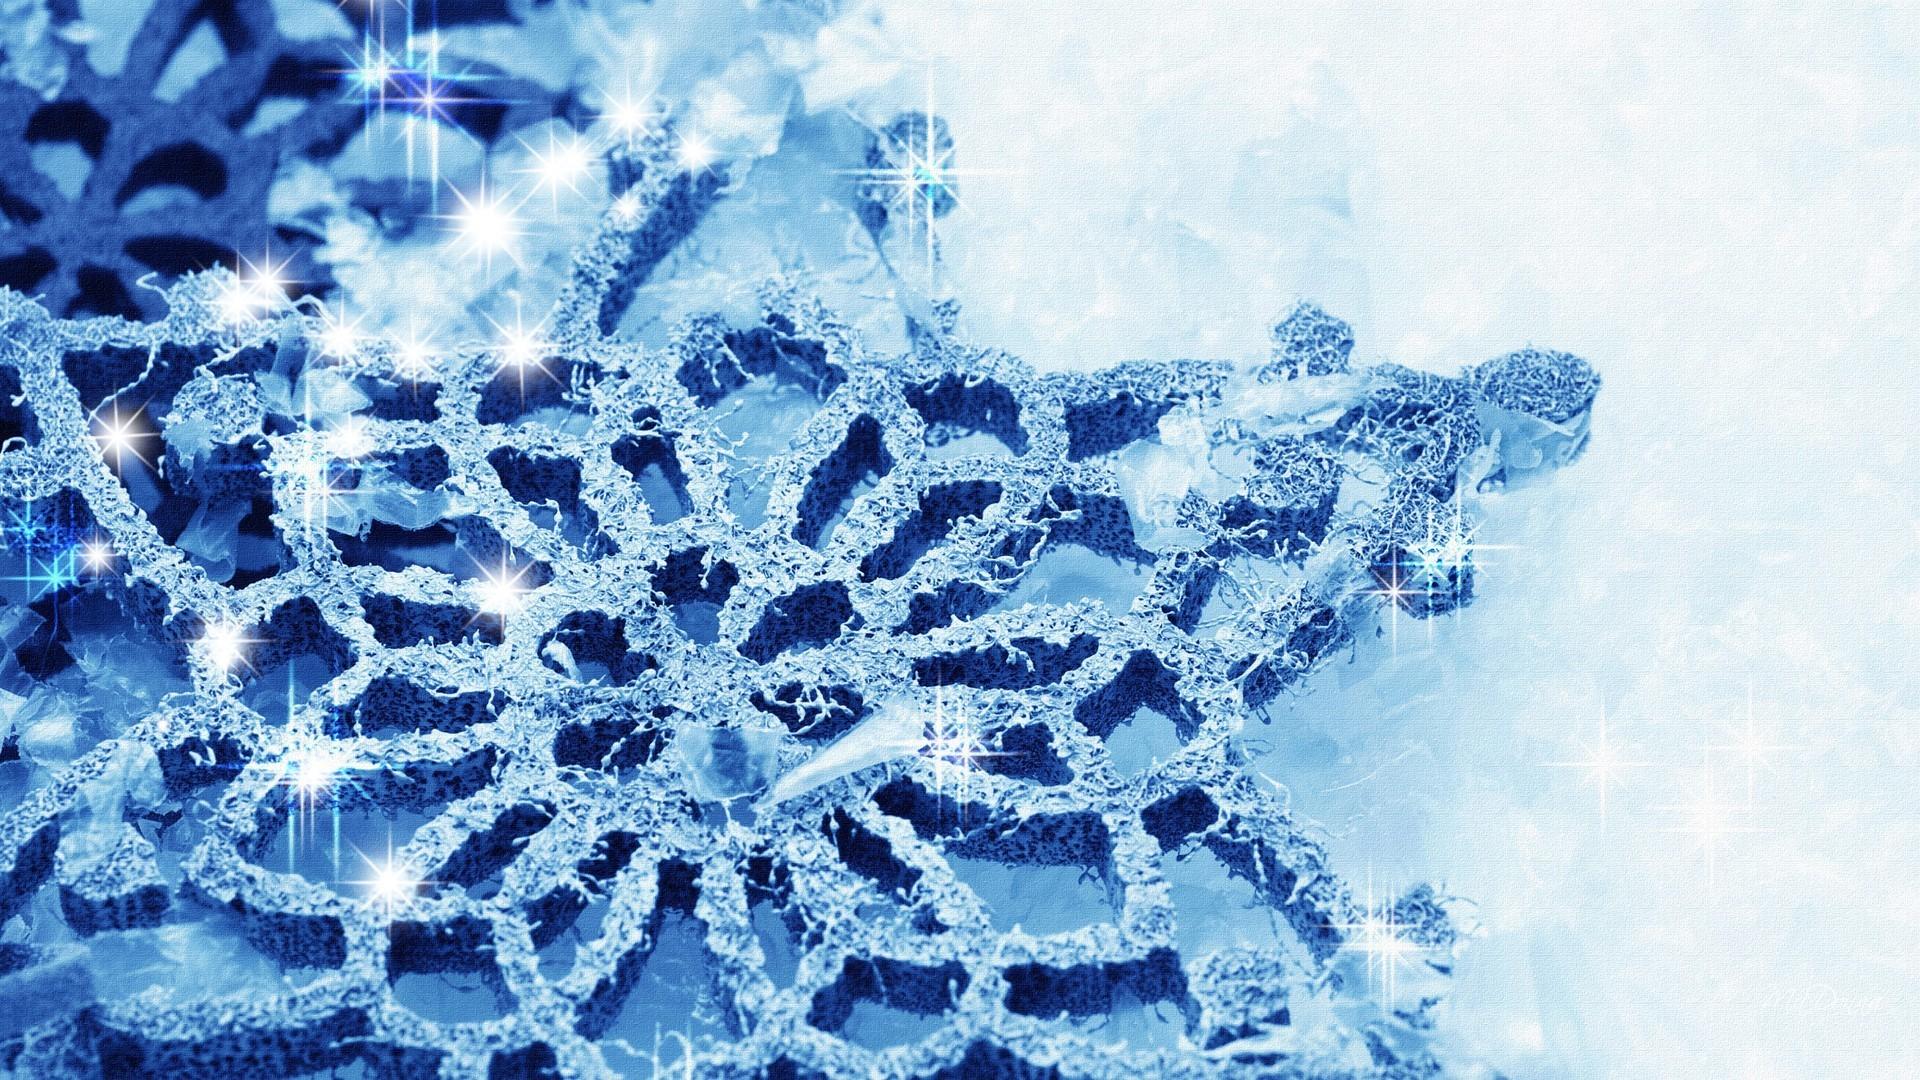 Blue Persona Shine Firefox Snowflake Cold Snow Crystal Stars Winter  Diamonds Desktop Screensavers – 1920×1080